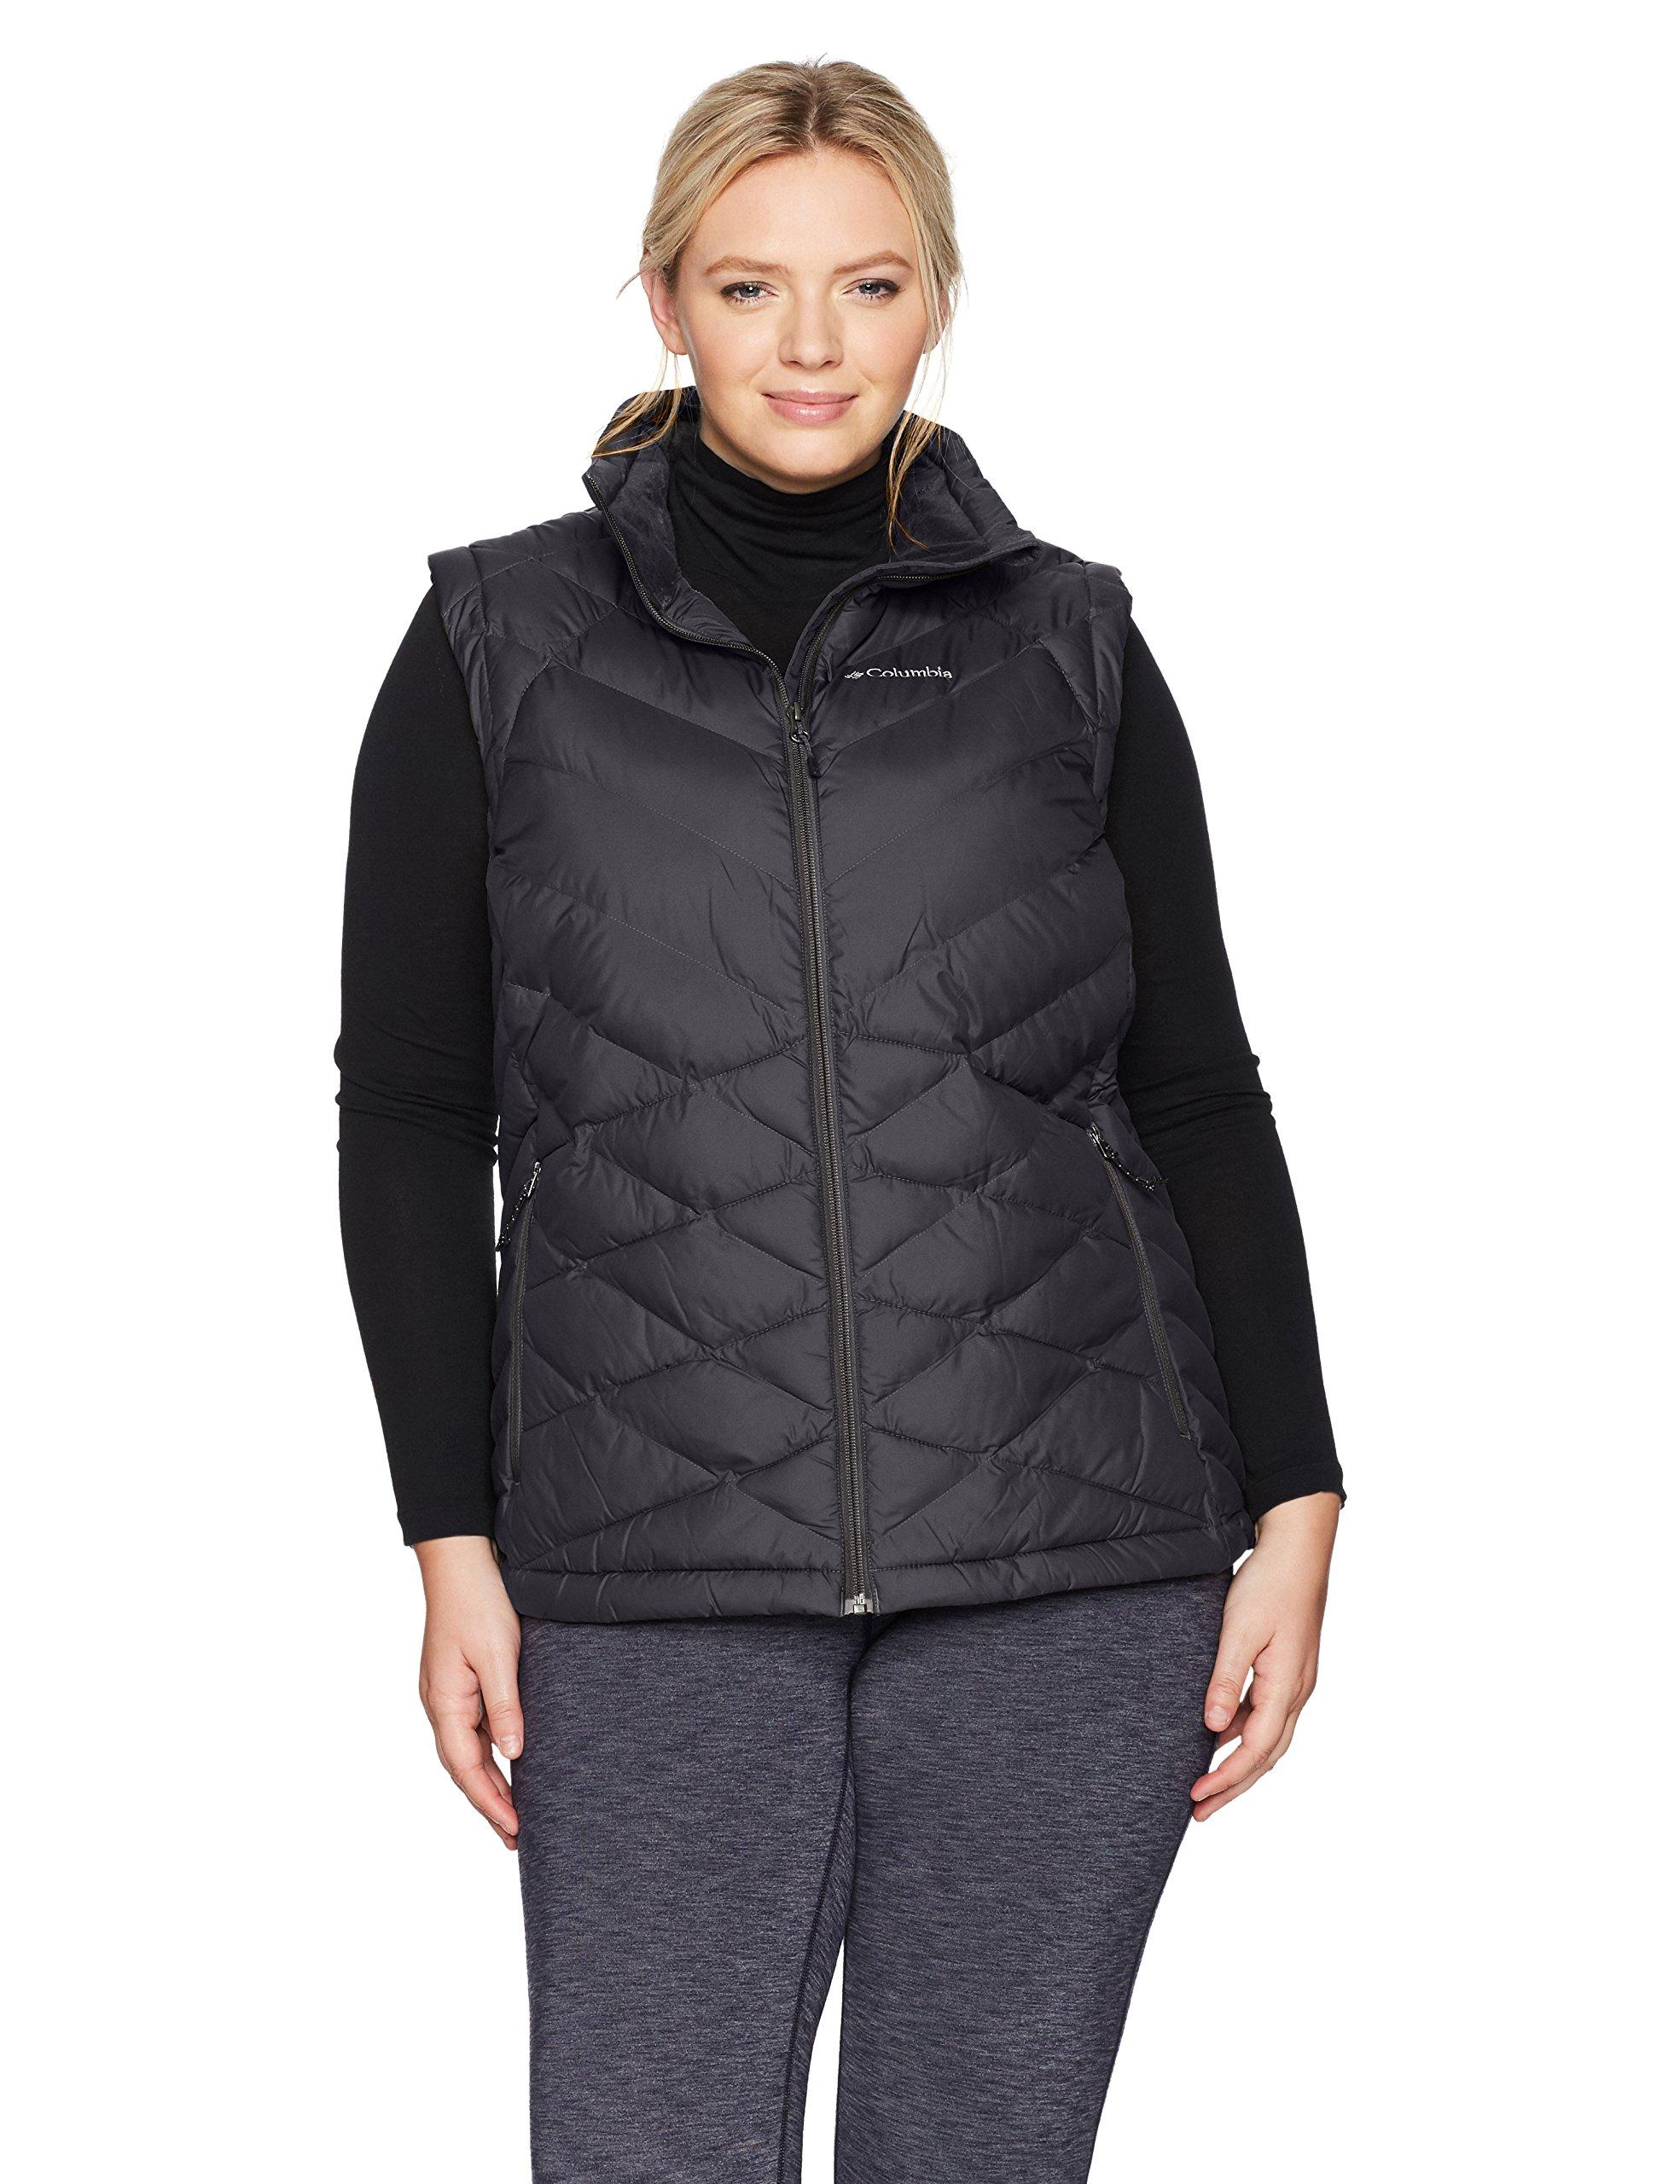 Columbia Women's Plus Size Heavenly Vest, Black, 1X